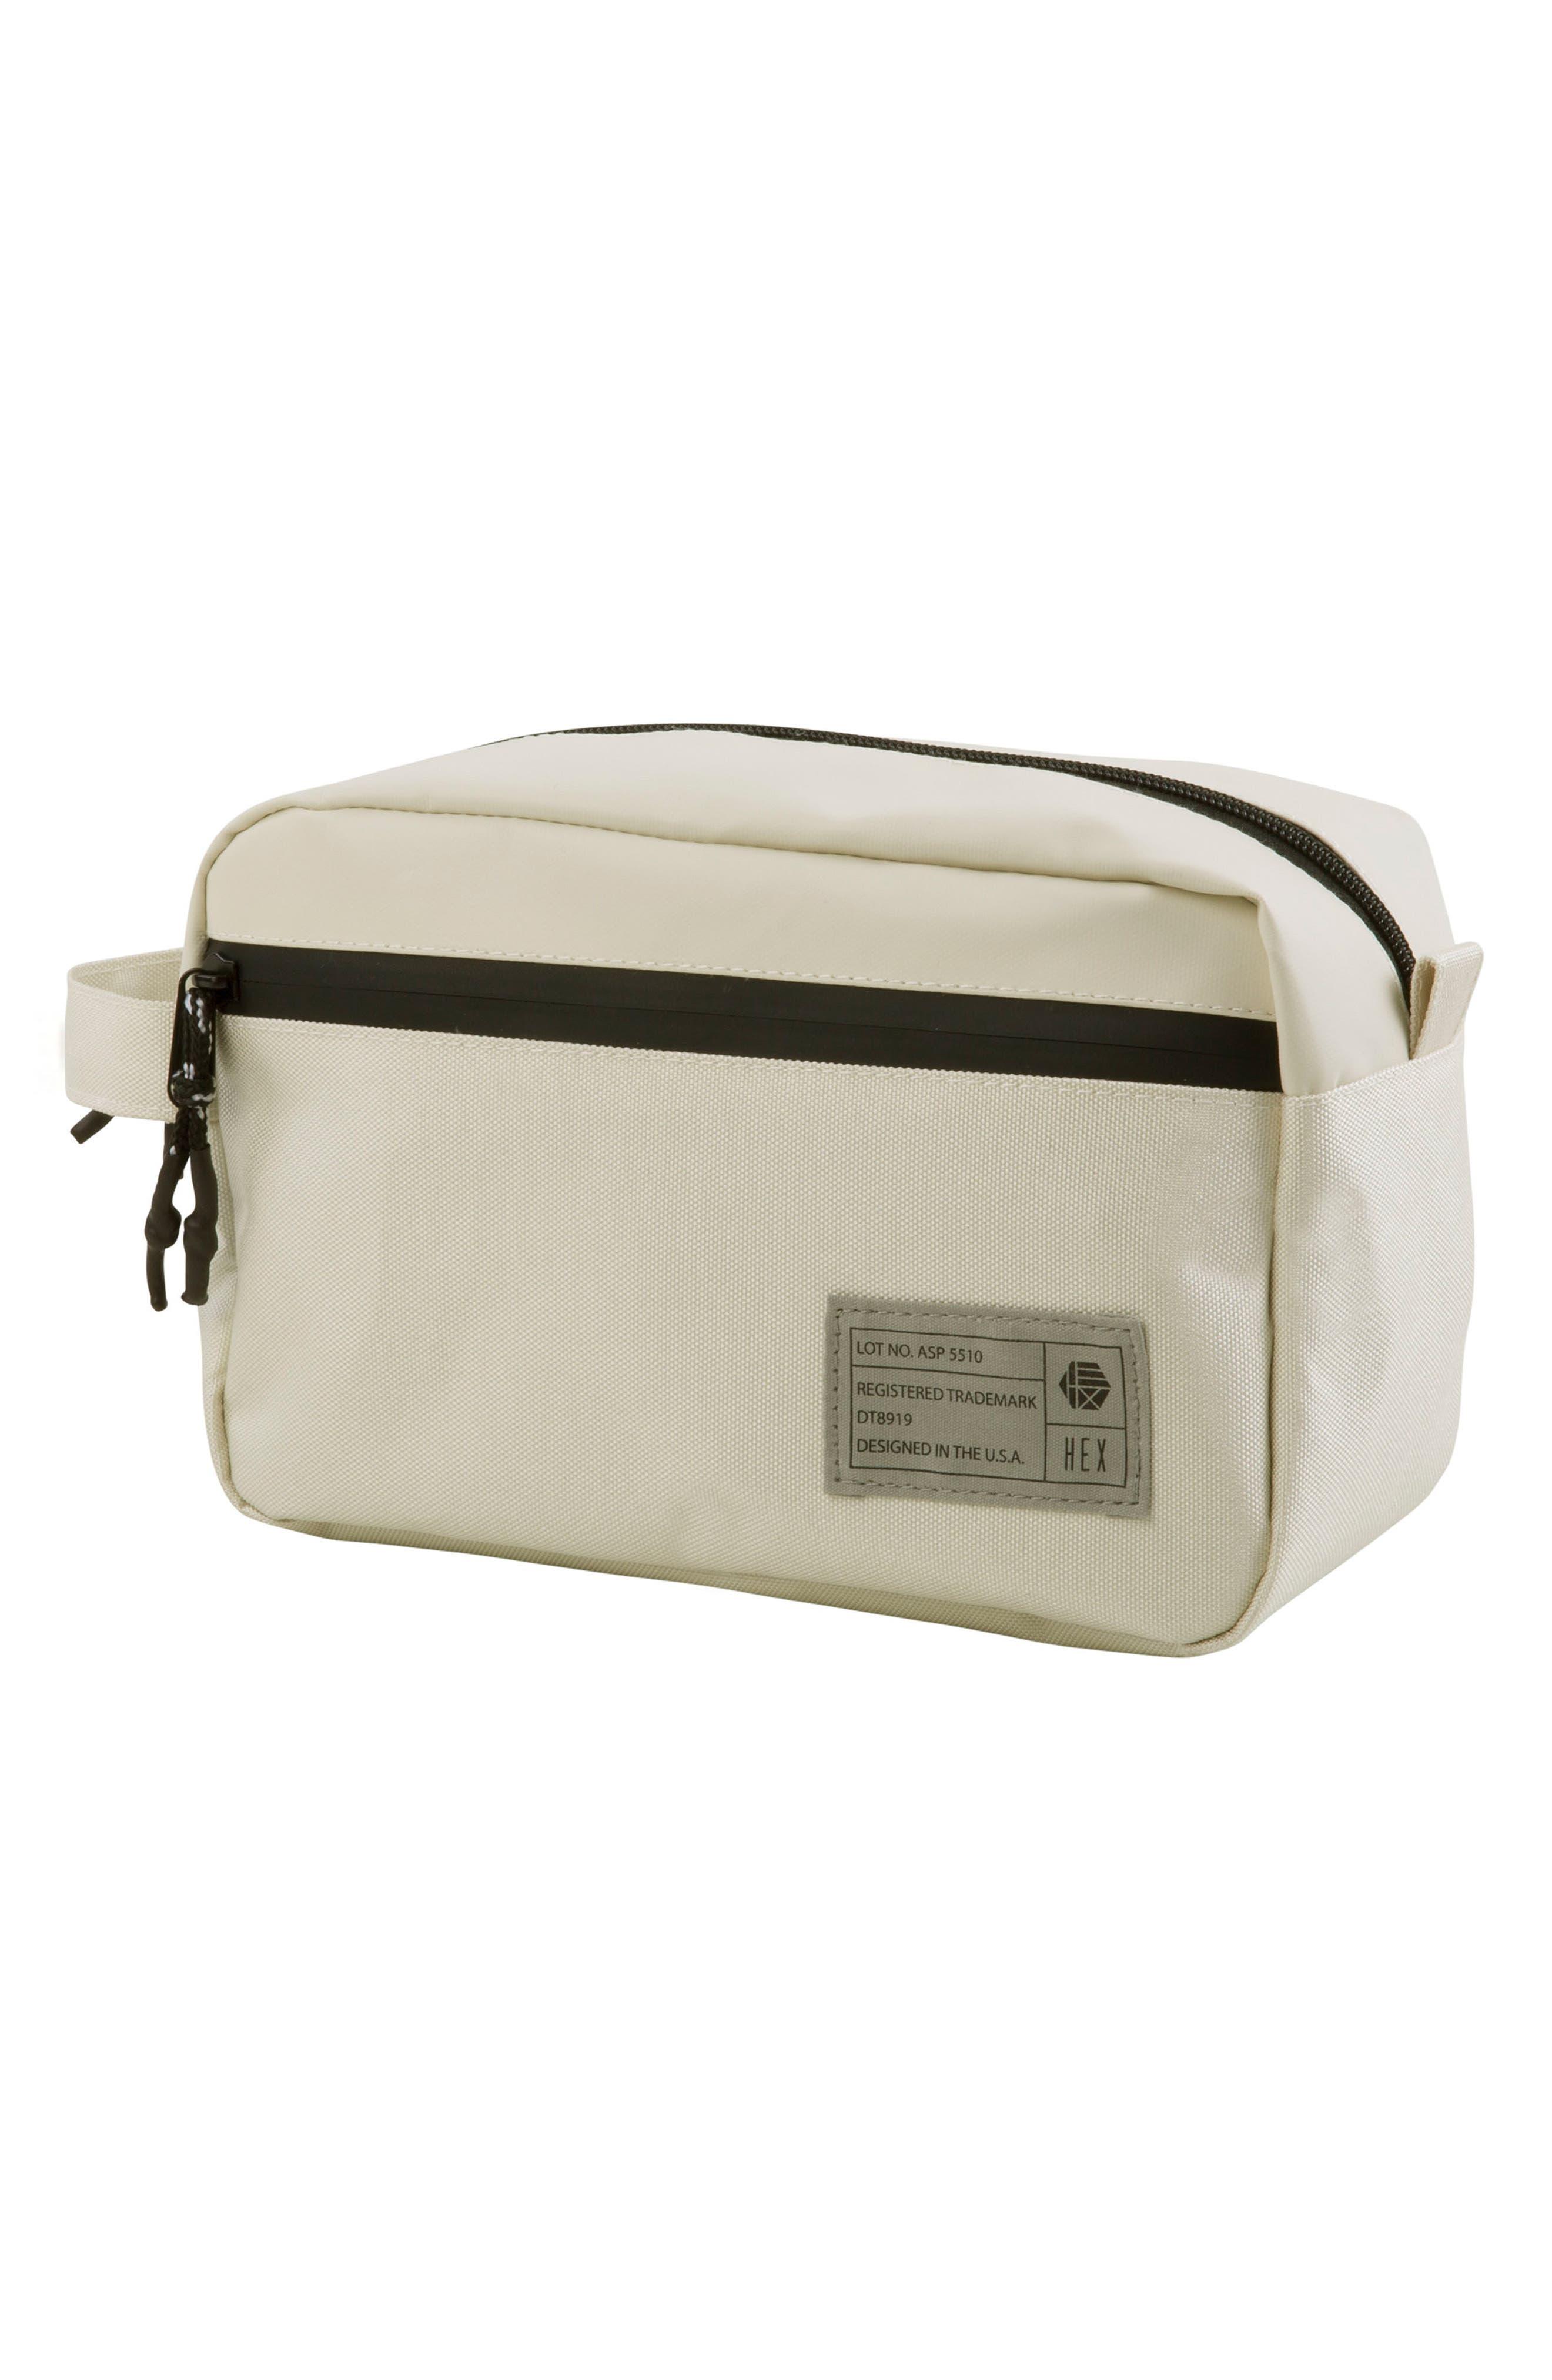 Aspect Travel Kit,                         Main,                         color, Ivory